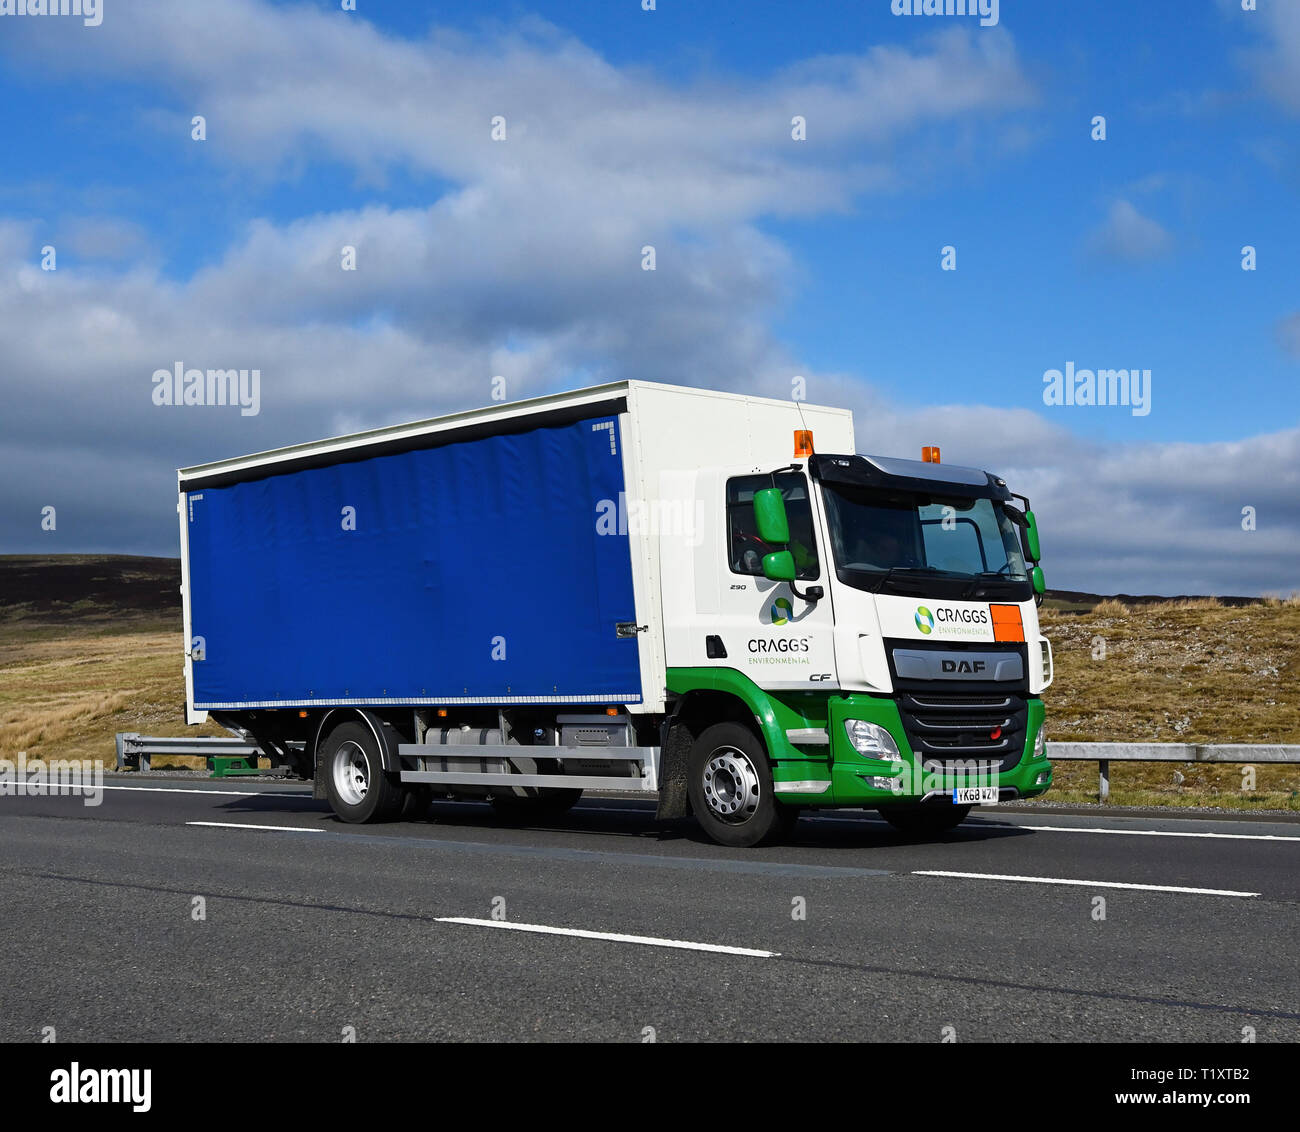 Craggs Environmental HGV. M6 Motorway, Southbound, Shap, Cumbria, England, United Kingdom, Europe. Stock Photo